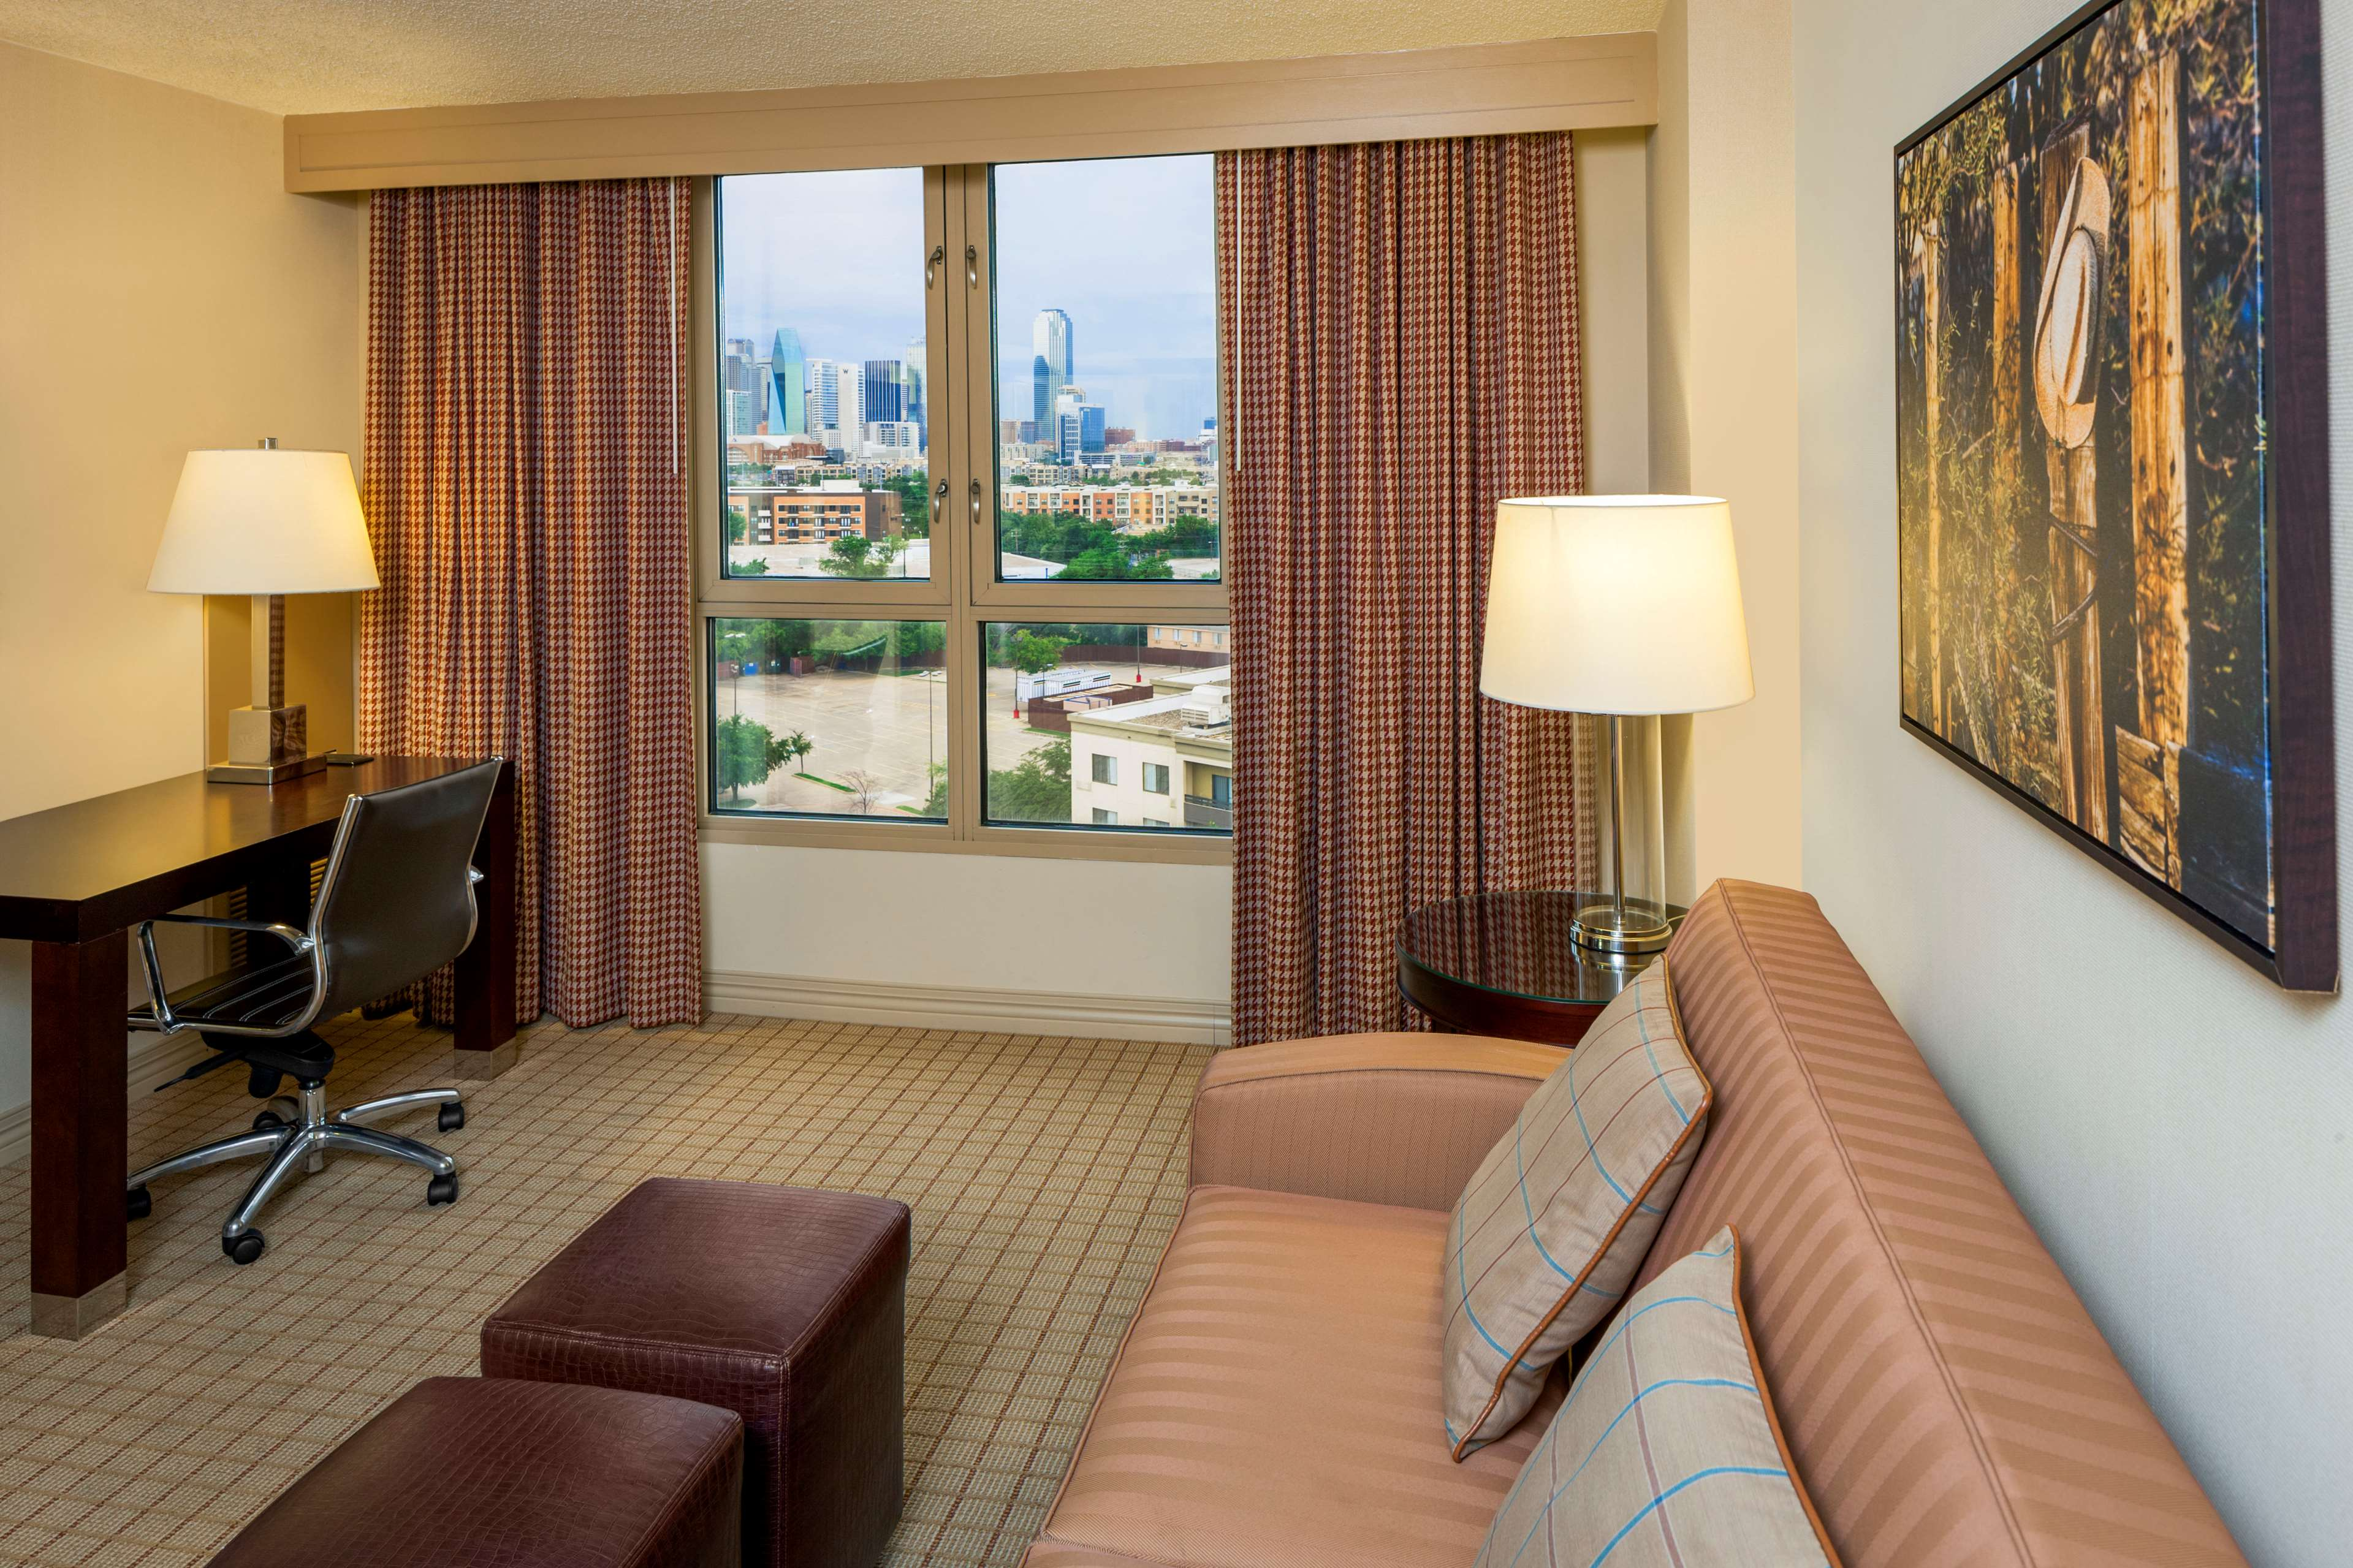 Sheraton Suites Market Center Dallas image 3